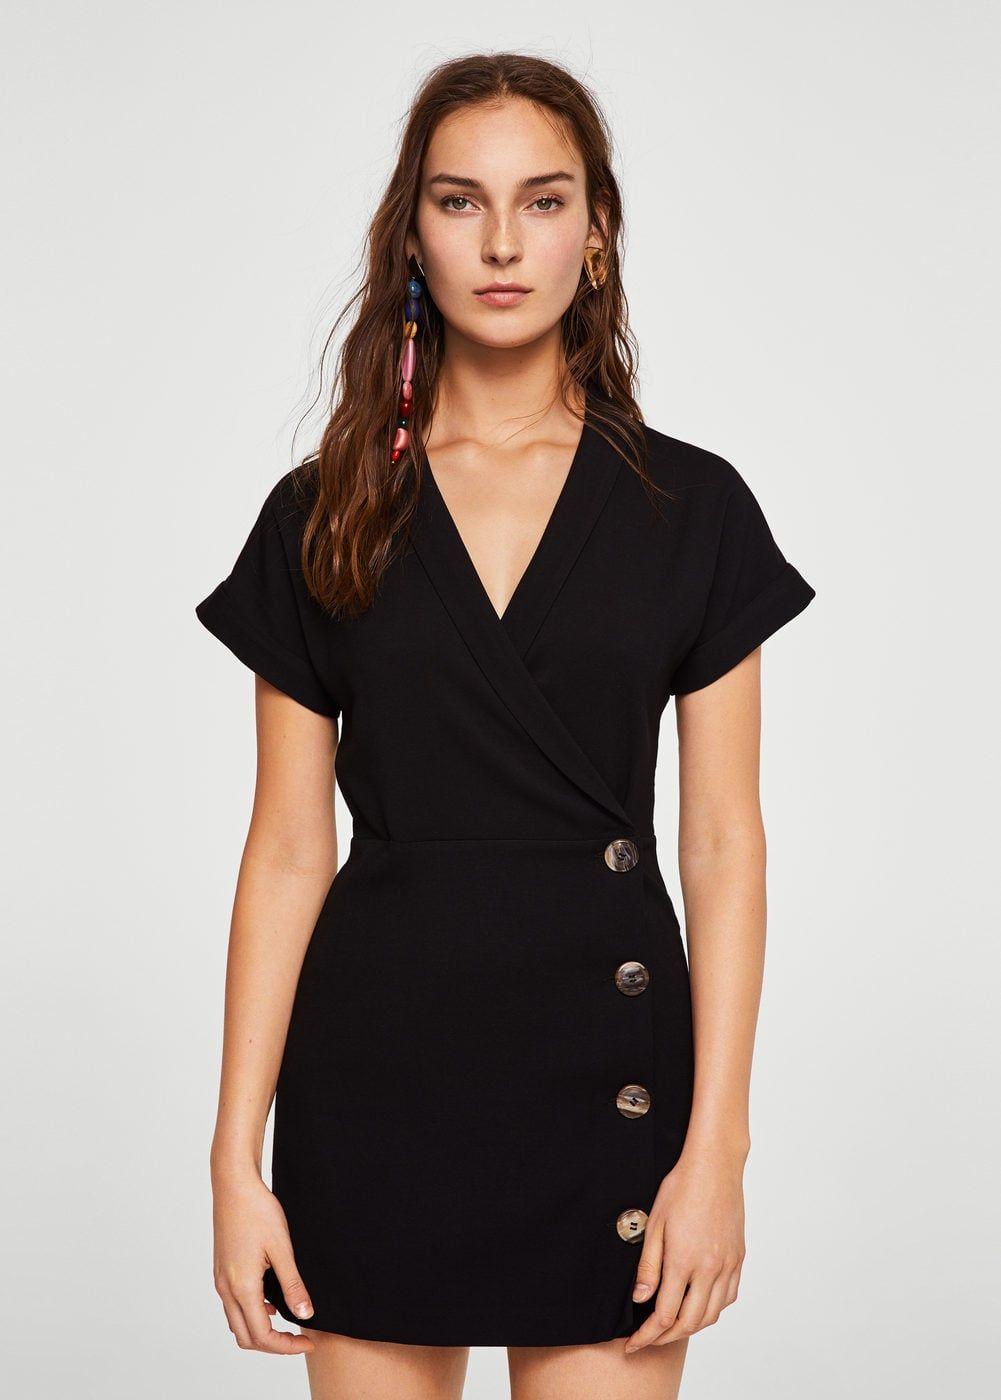 Short buttoned dress - Women   Home  Living   Pinterest   Dresses ... e3efc2f541